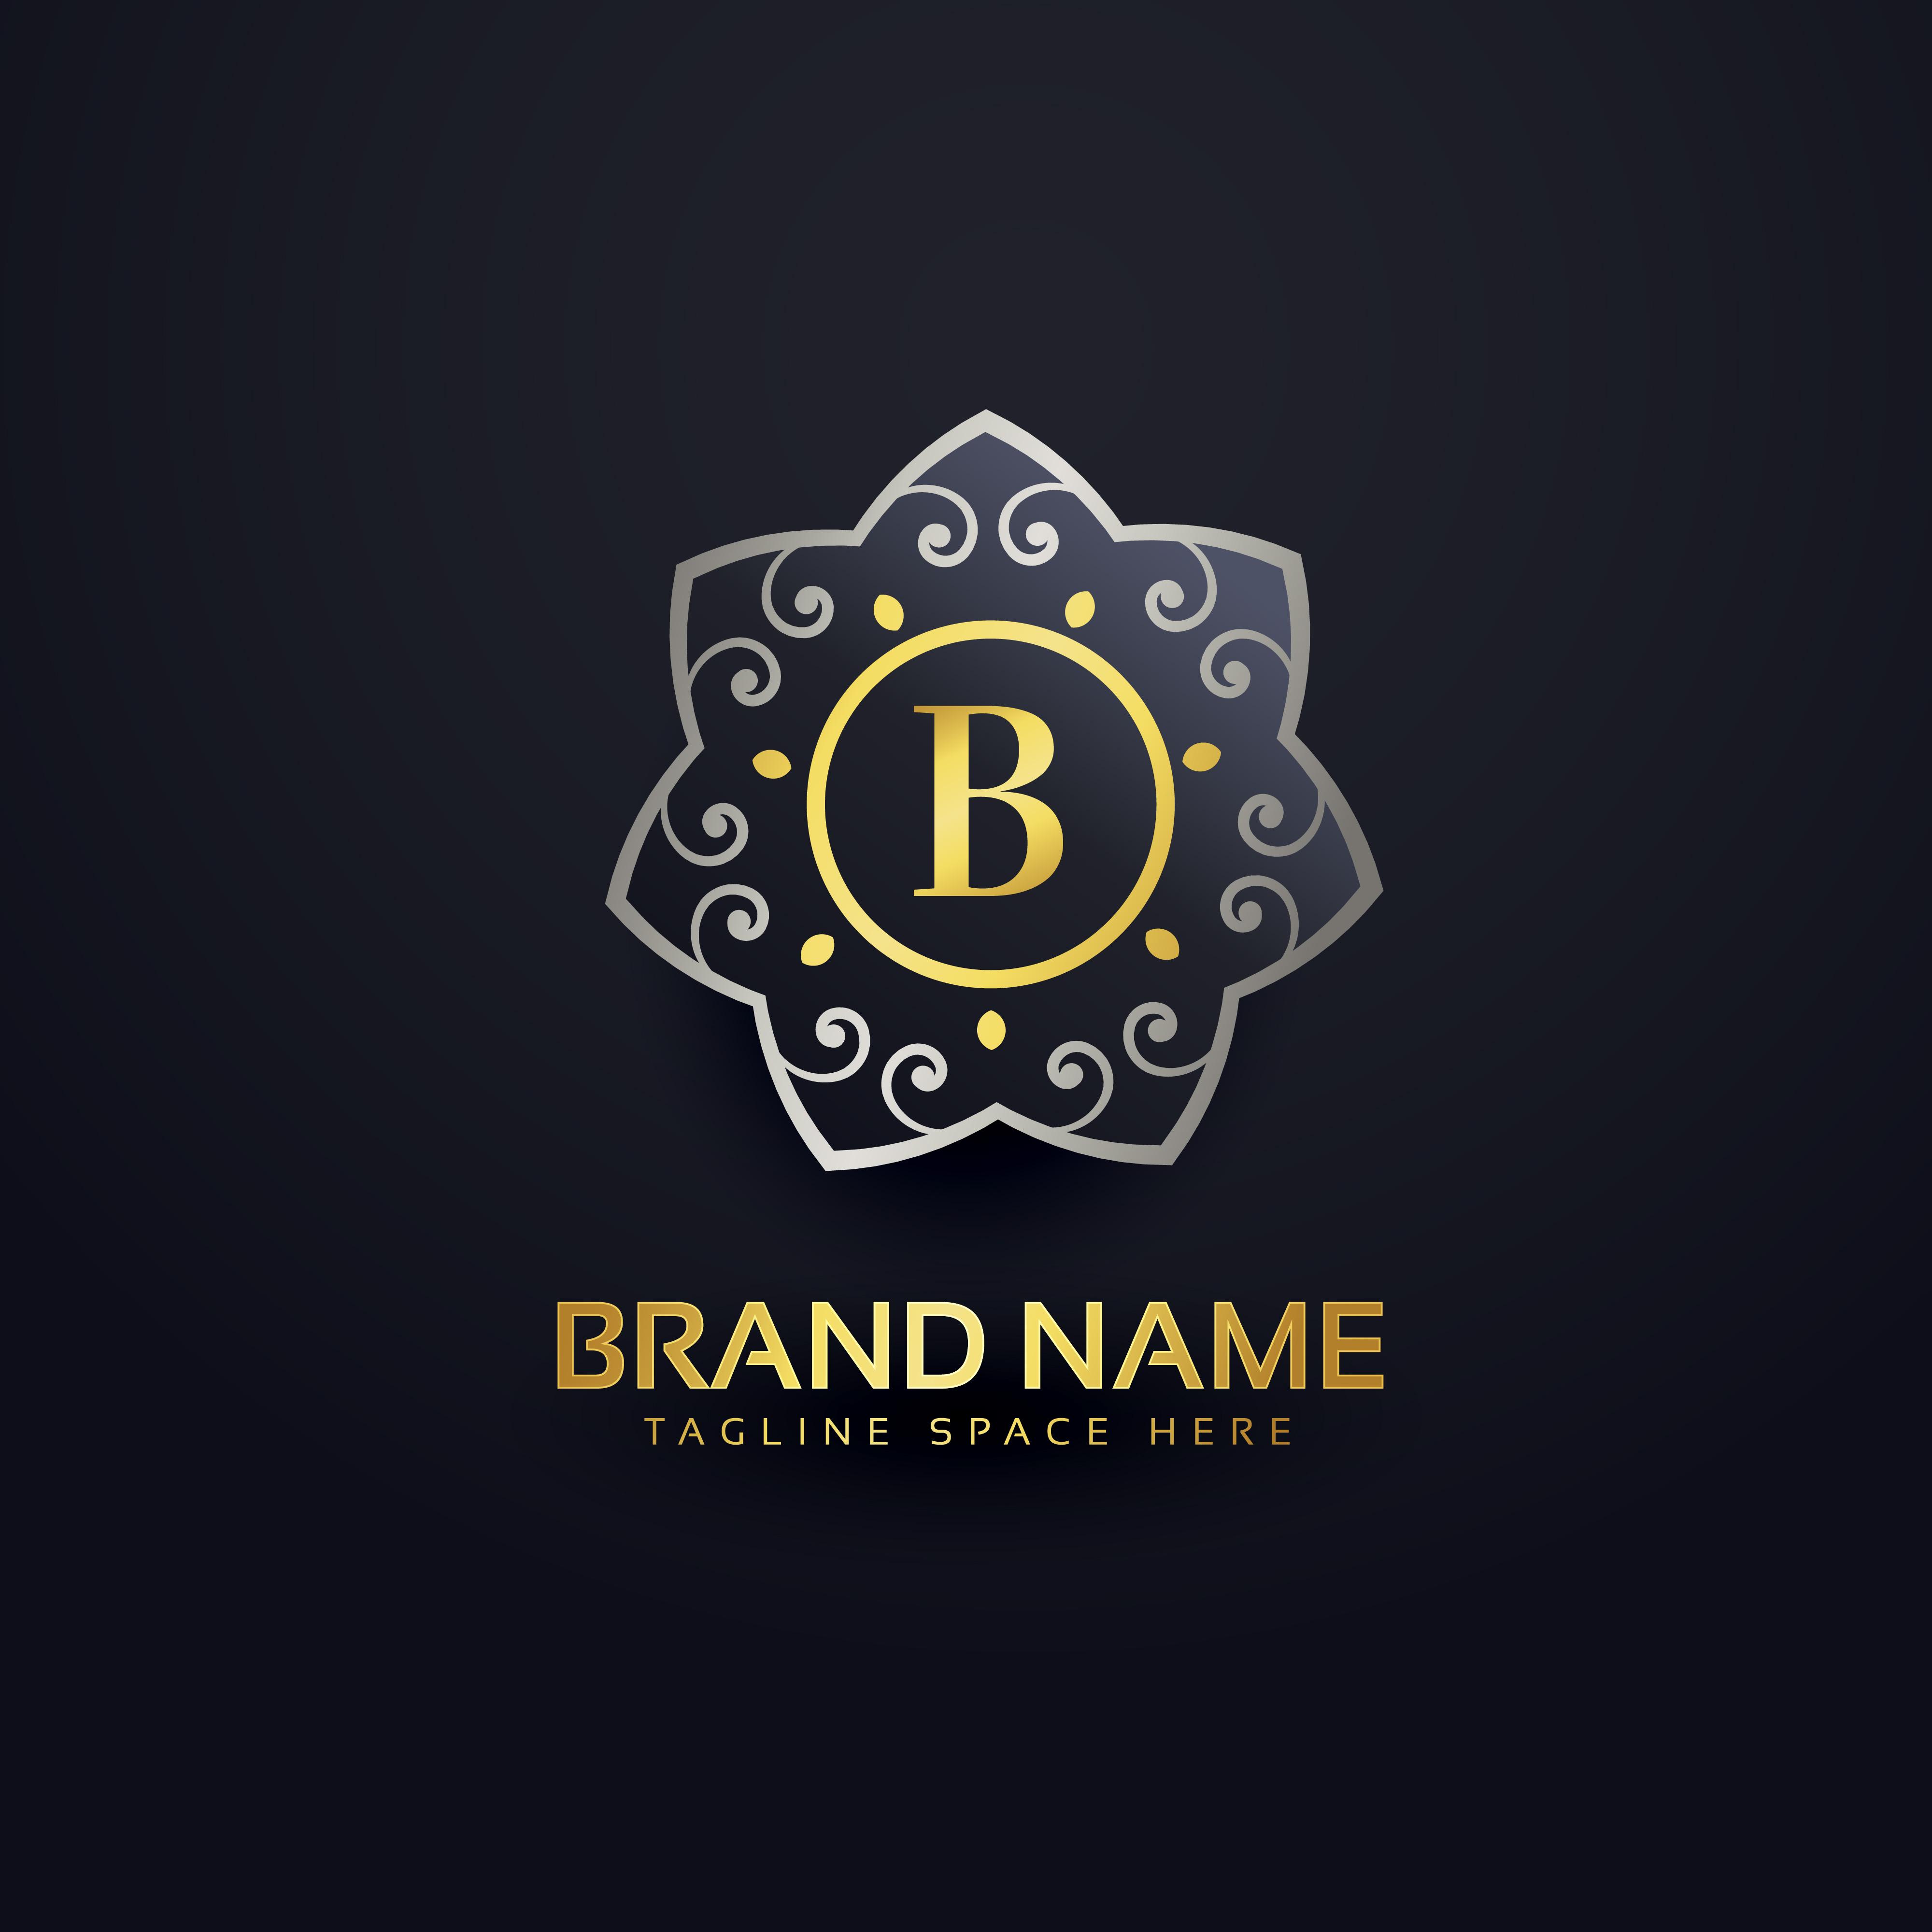 vector-letter-b-logo-design-with-floral-element Antique Monogram Letter C Template on